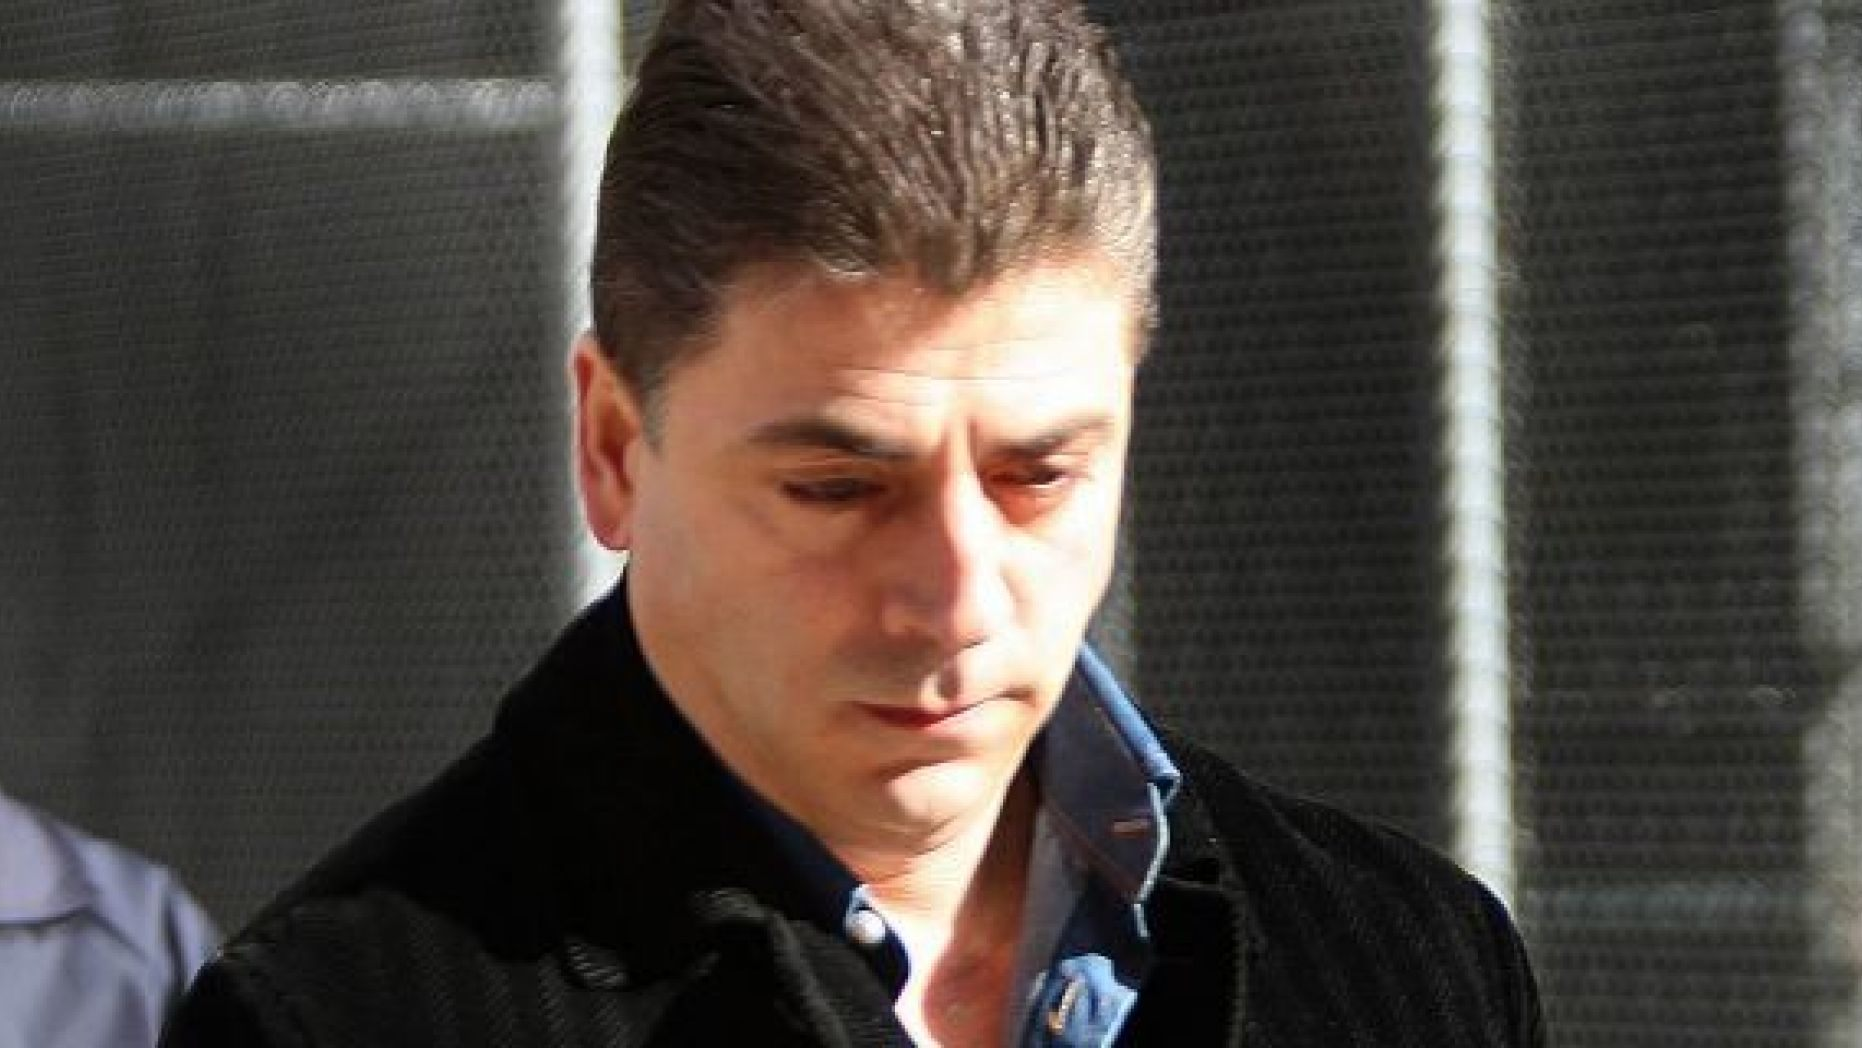 frank cali reputed mafia boss shot dead protothemanewscom